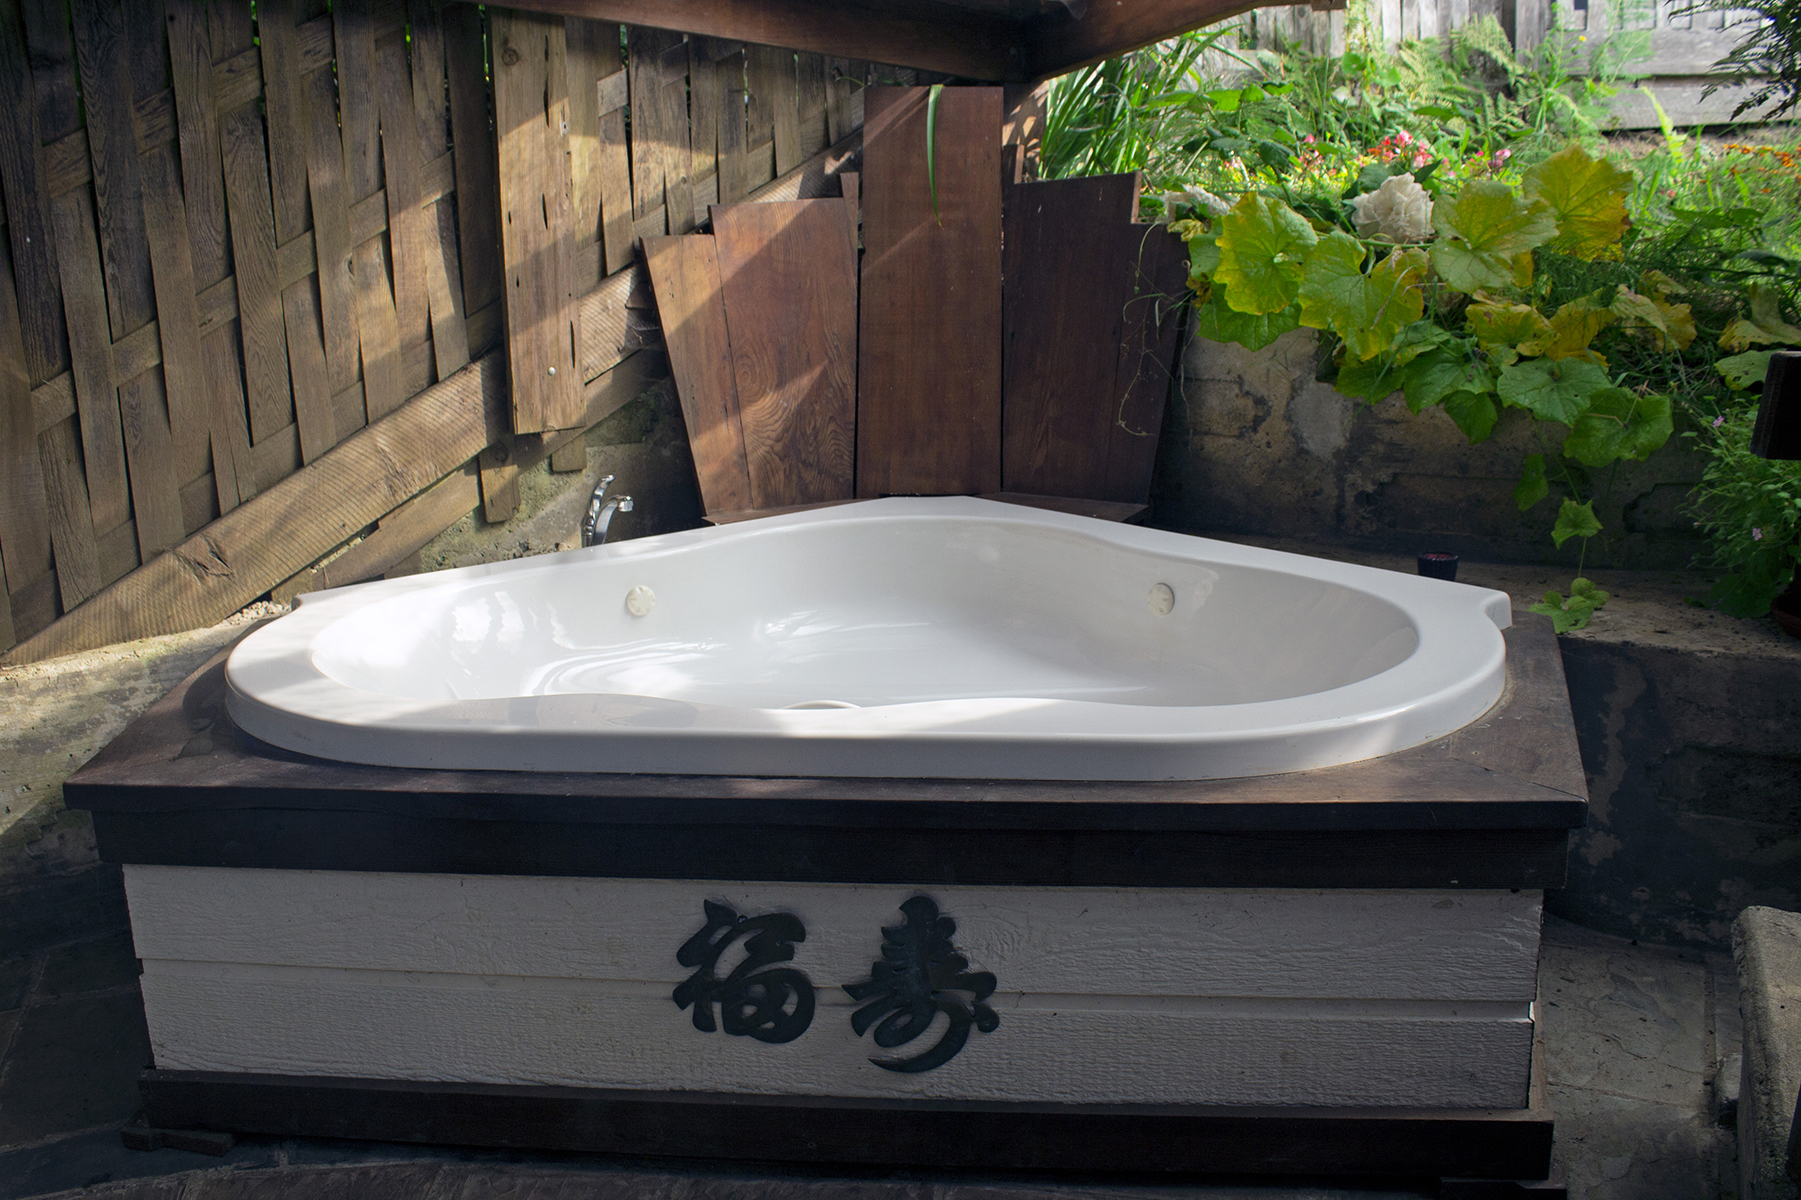 Hot Tub Octagon